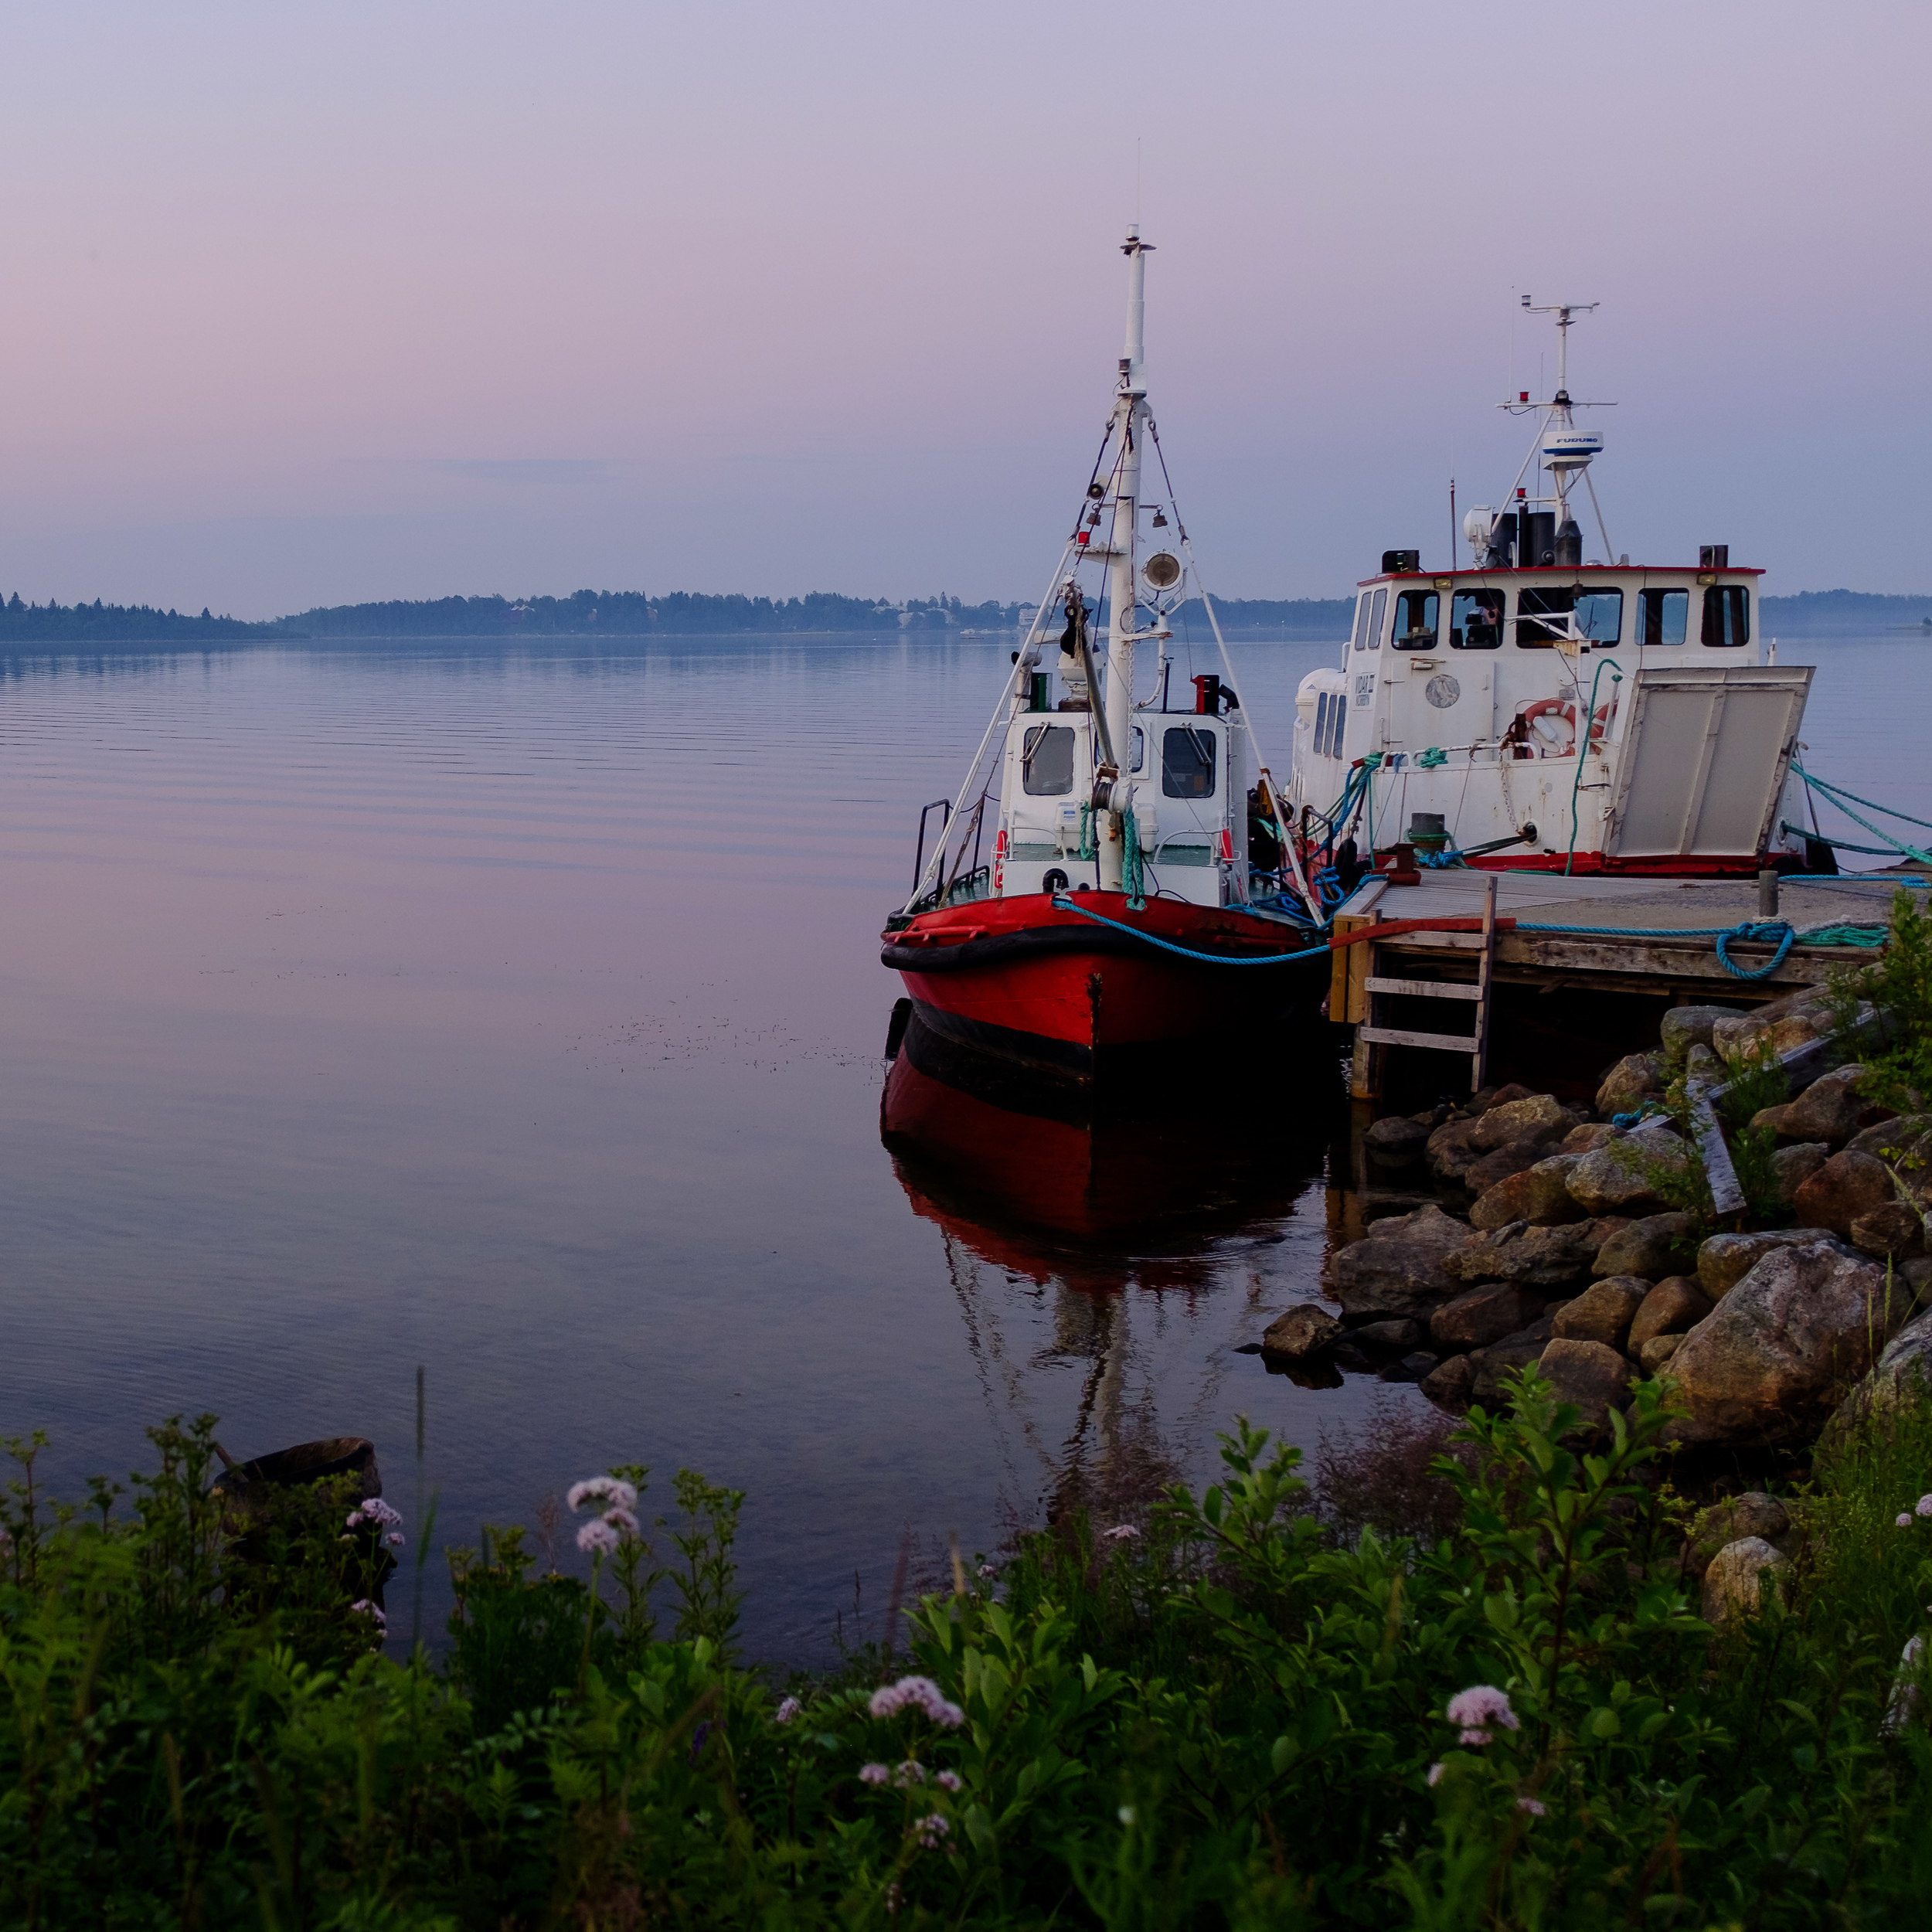 Norrland-5281.jpg